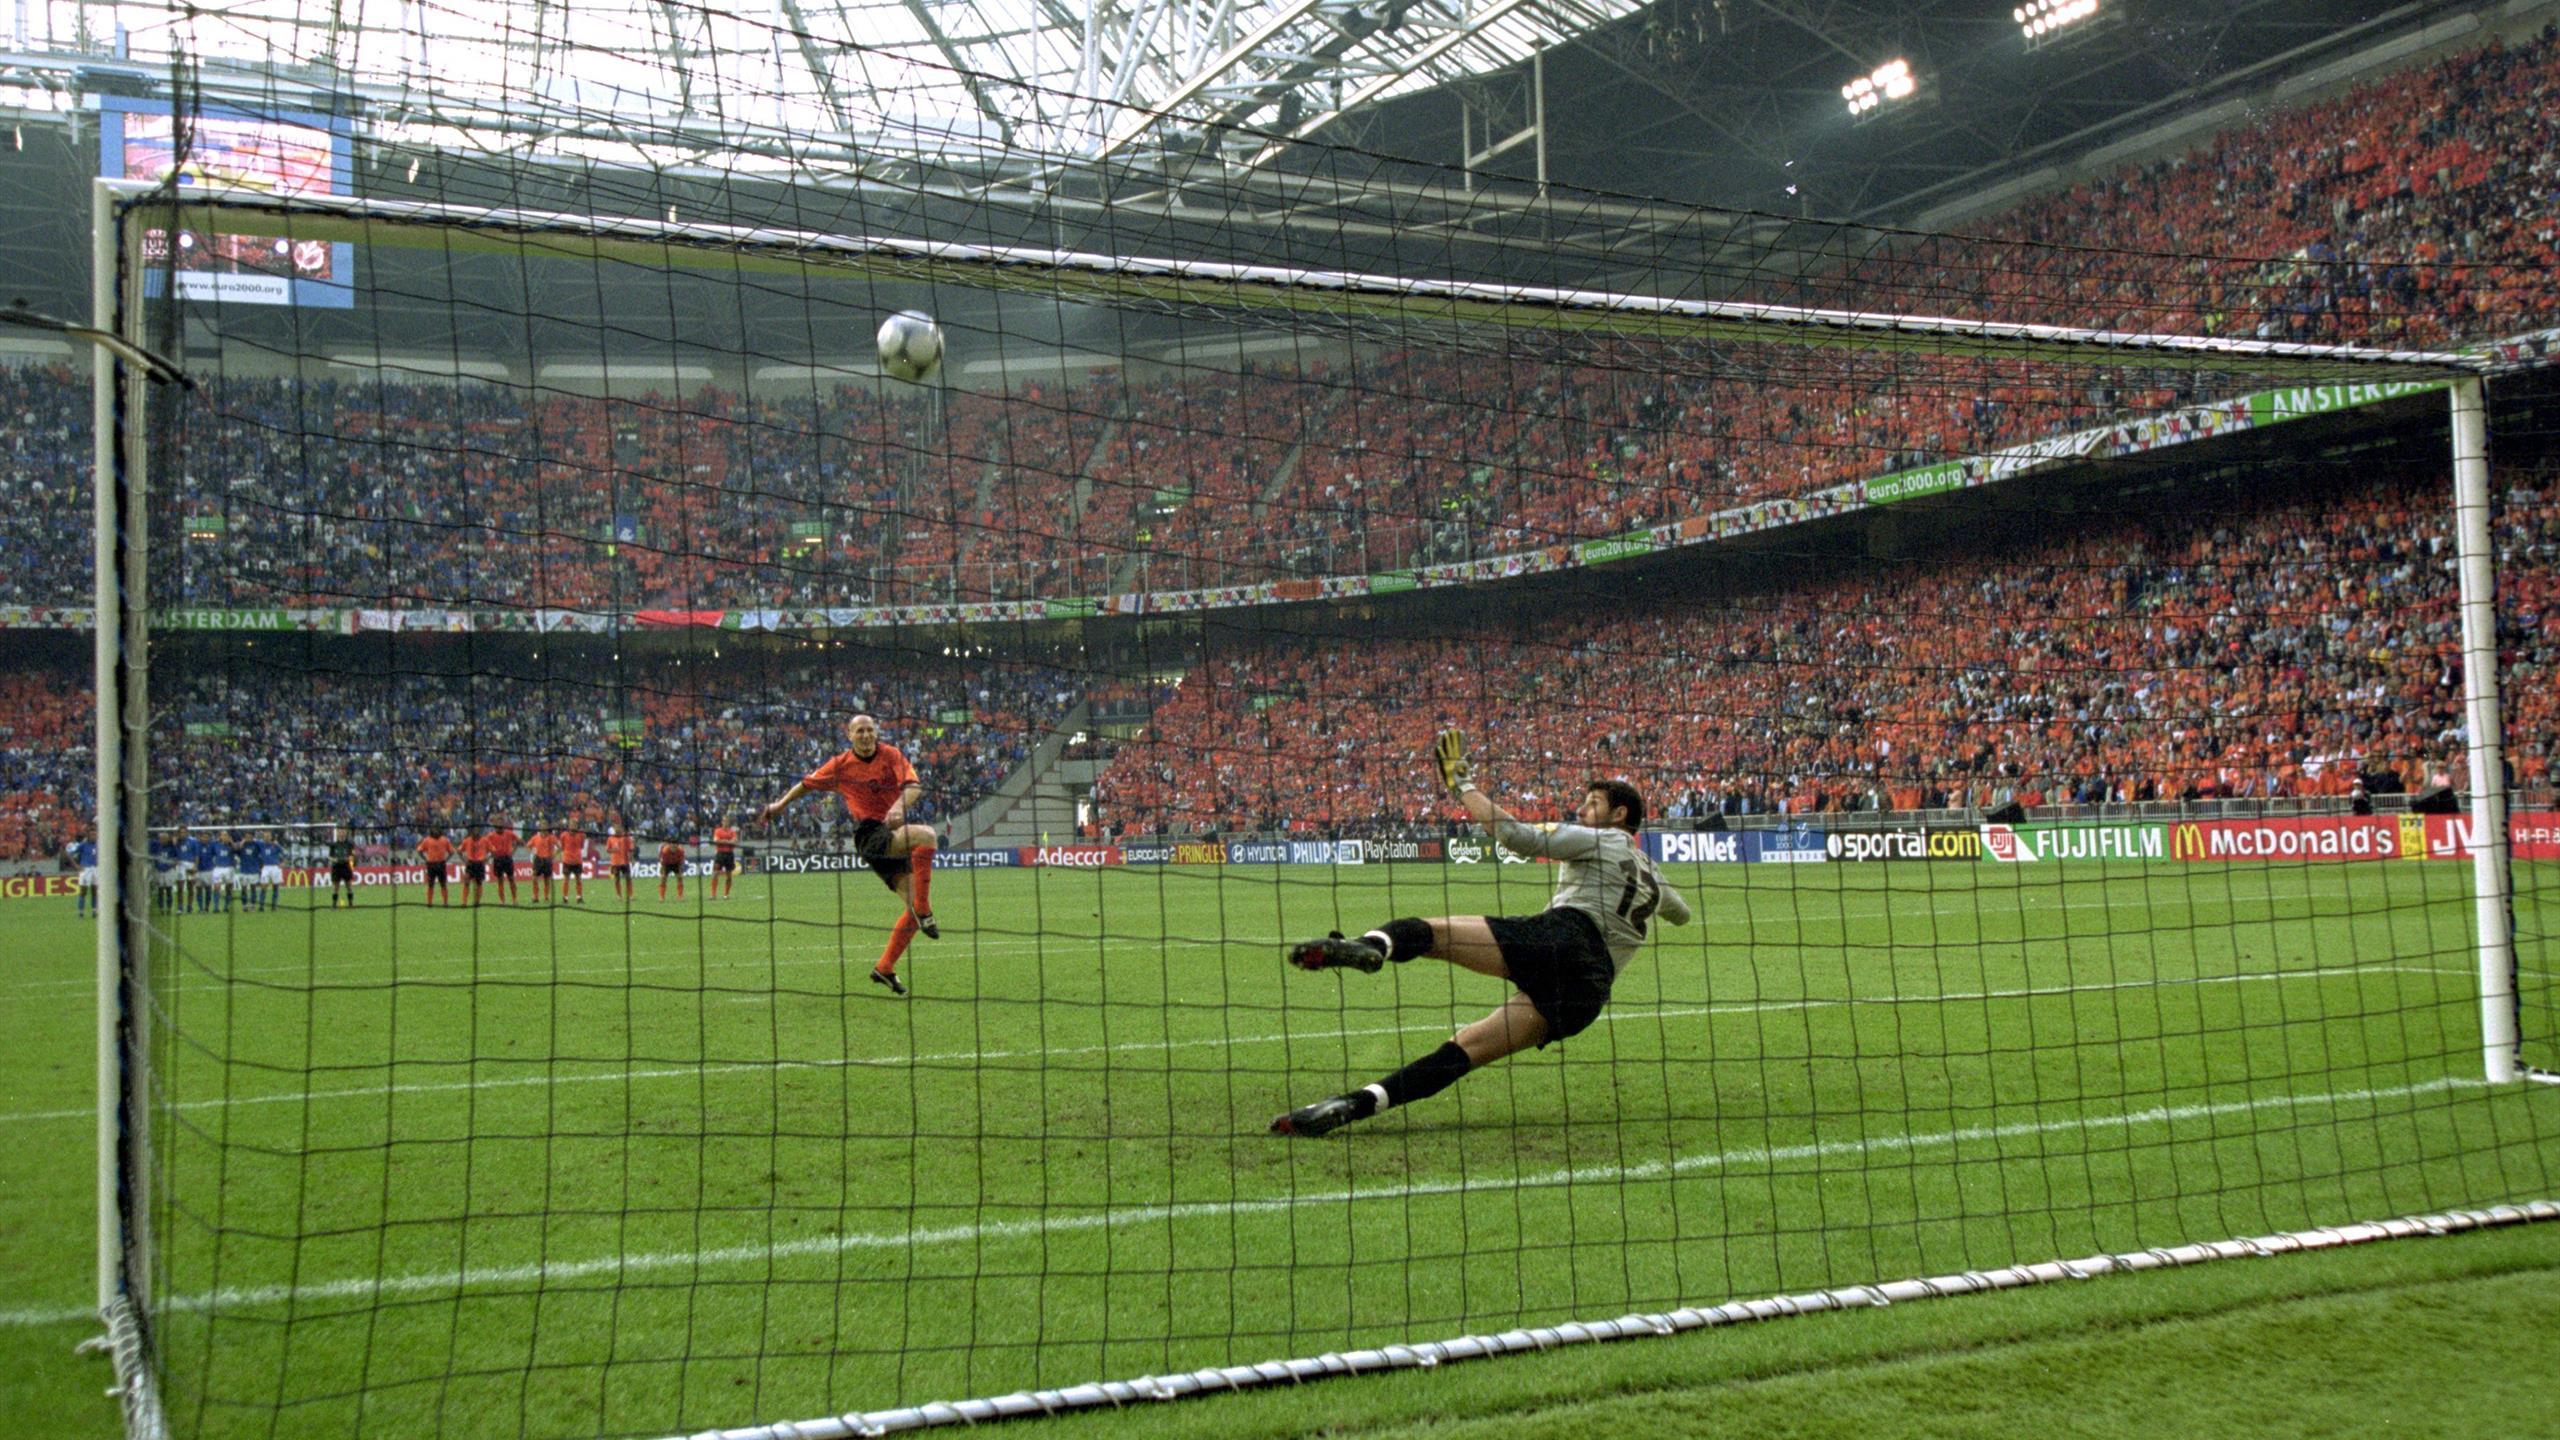 Golden Goal Golden Summer The Story Of Euro 2000 Eurosport